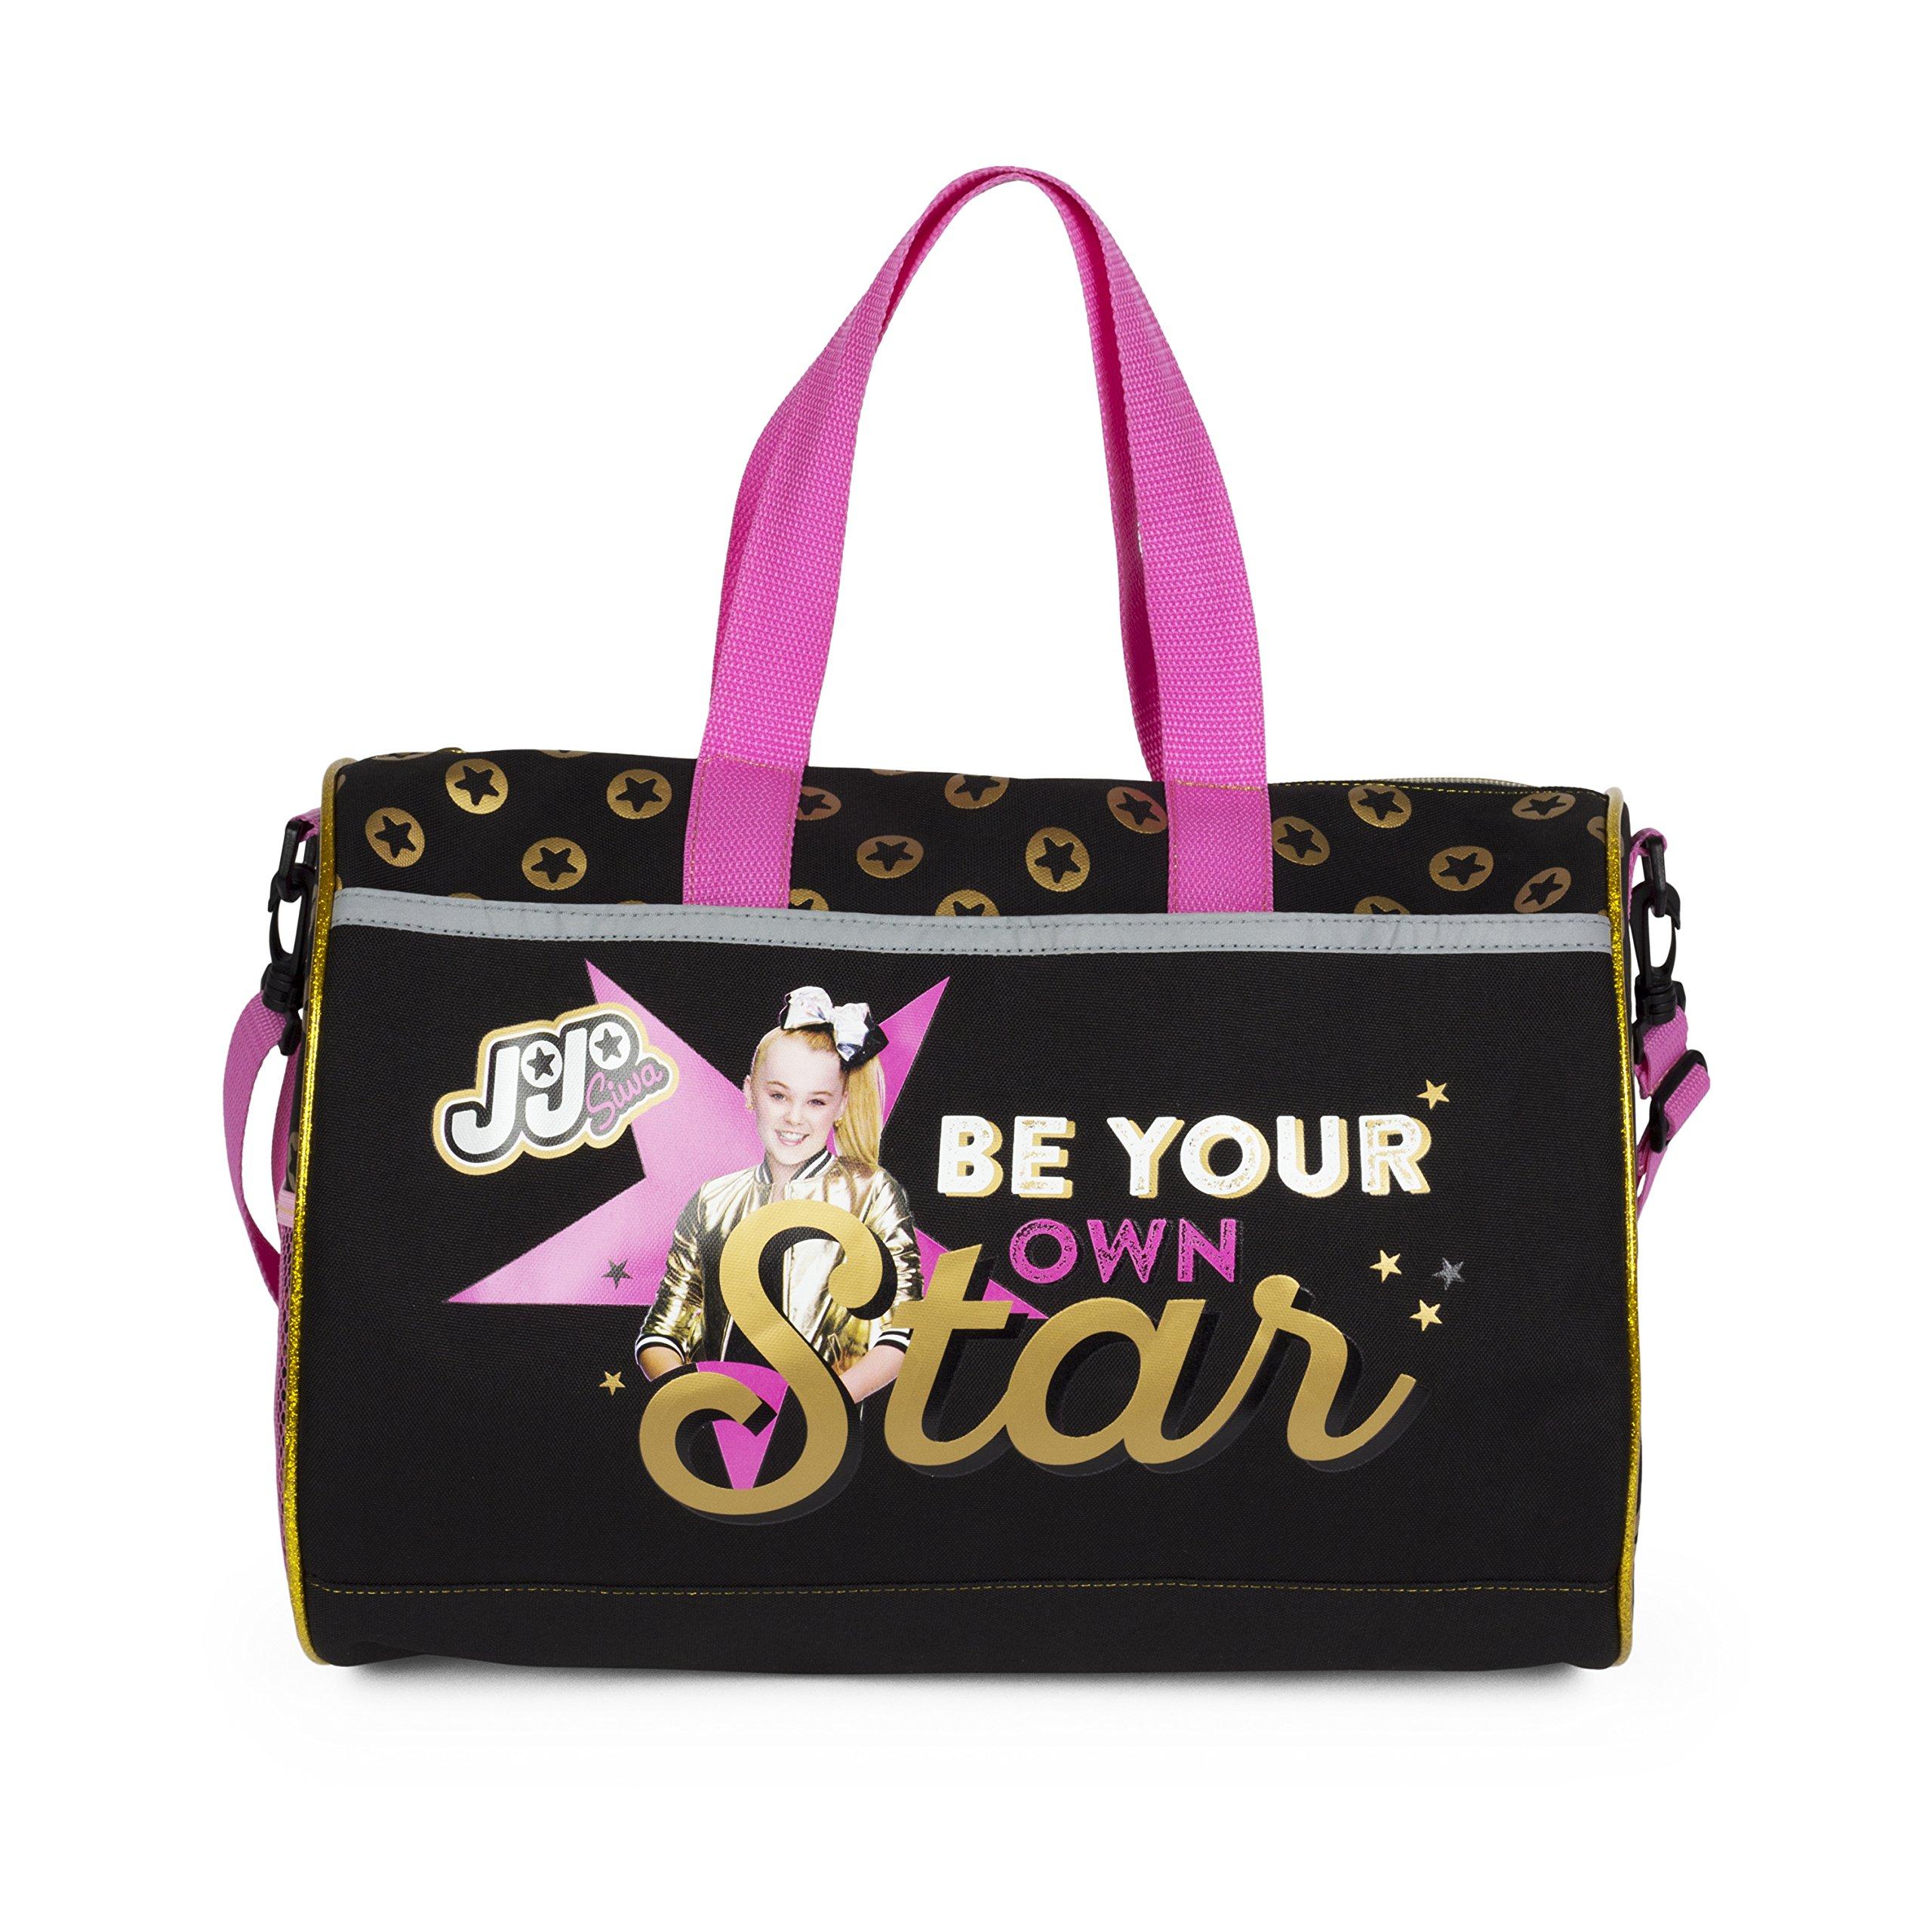 Nickelodeon Be Your Own Star JoJo Siwa Black Duffel Bag for Girls